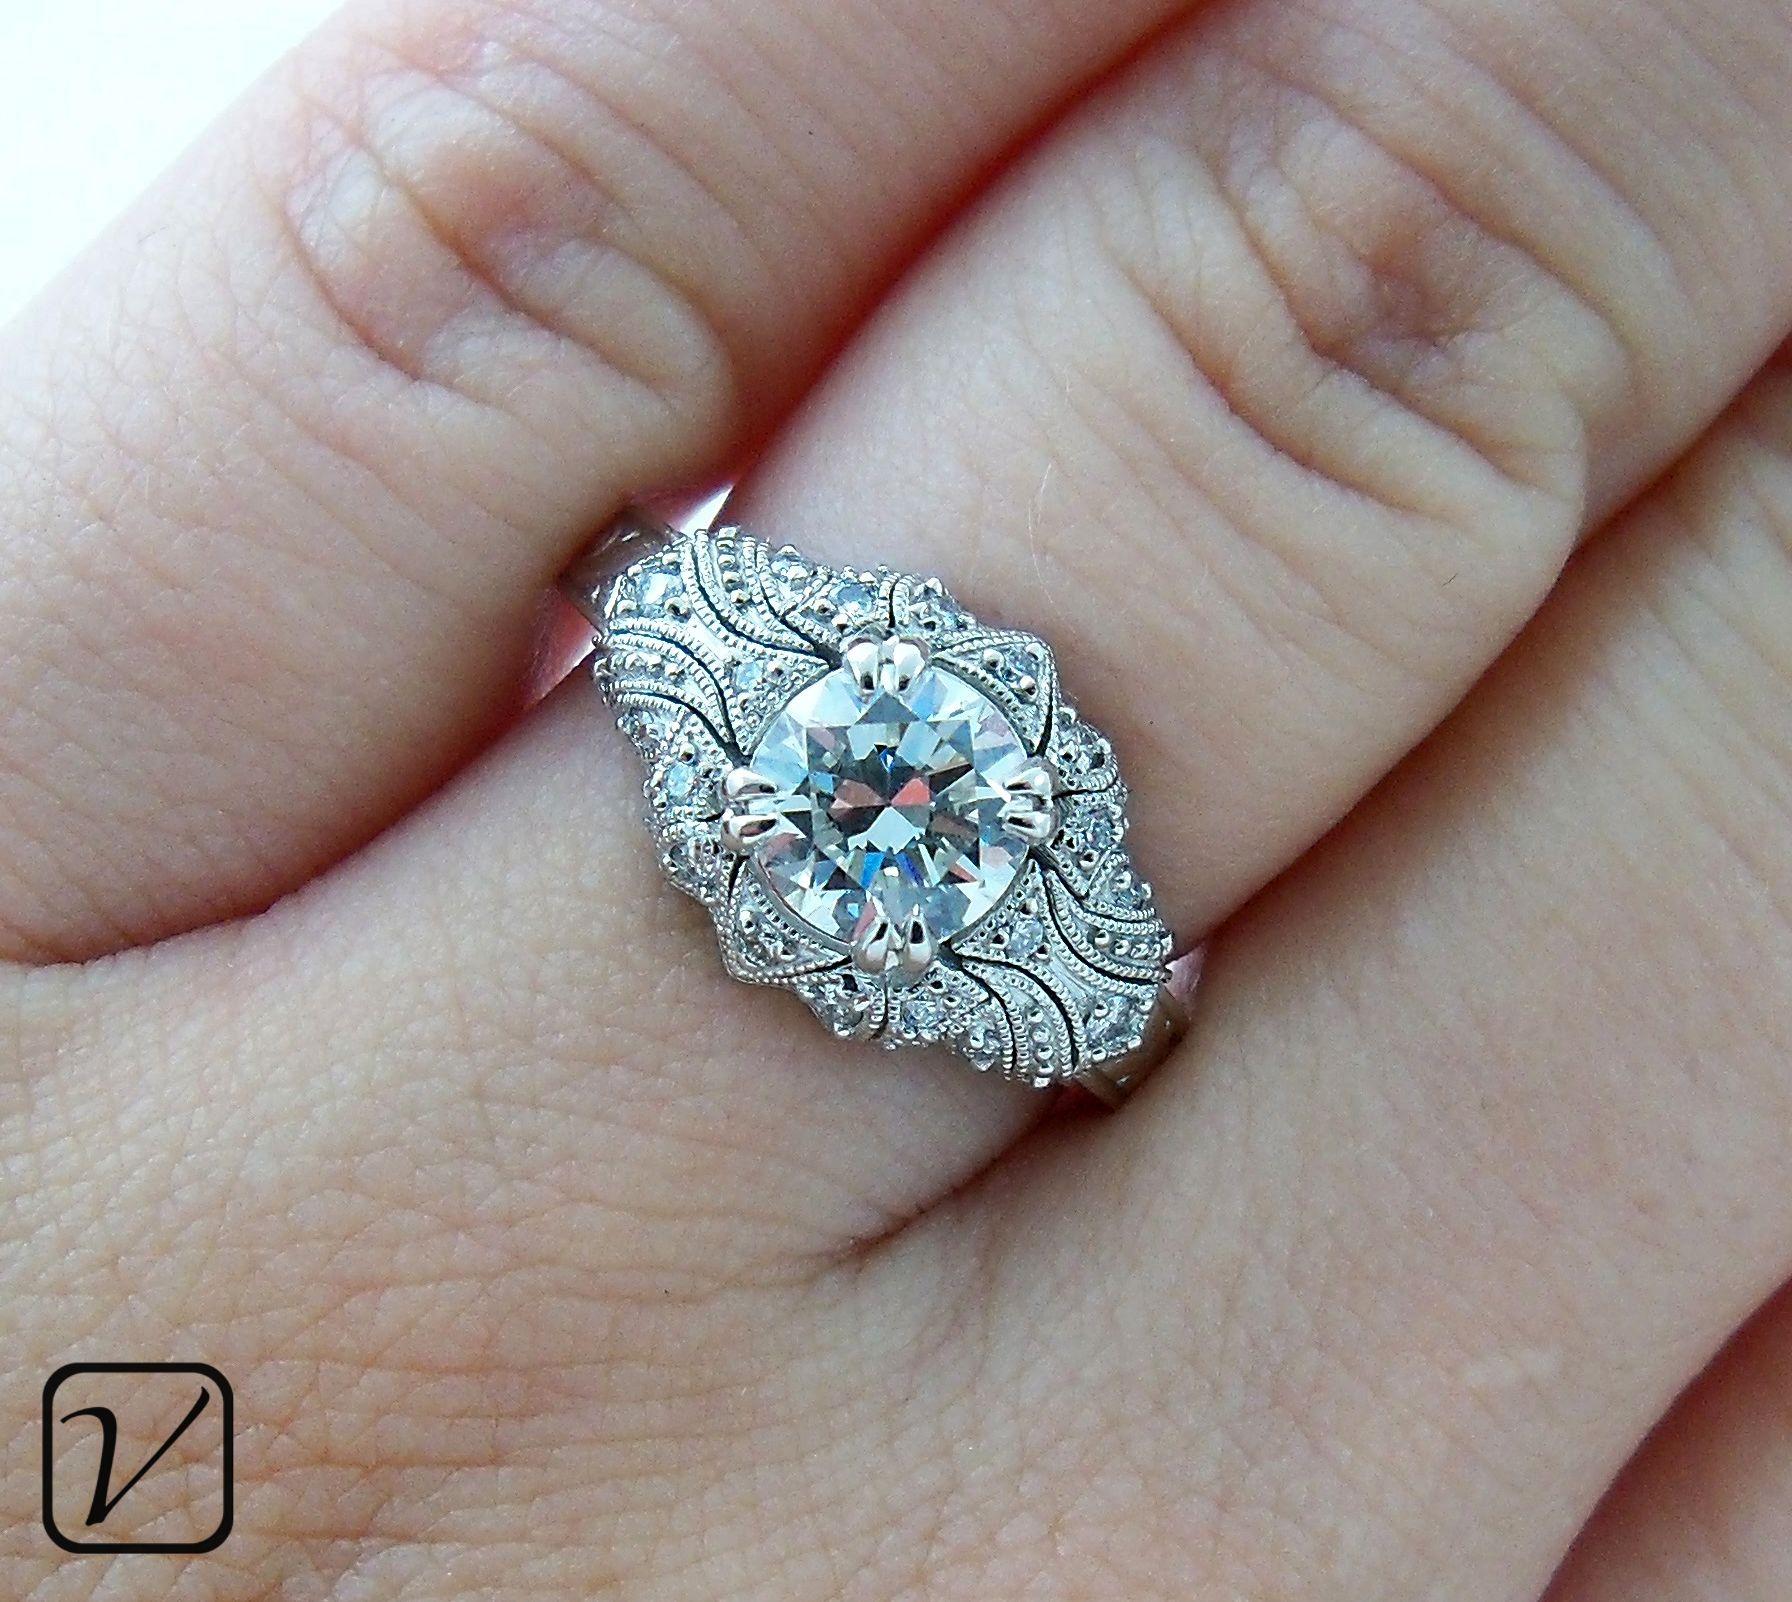 vintage wedding bands Wedding Rings Elegant Vintage Wedding Ring Emotional Vintage Ring Treasured Vintage Style Engagement Rings As Beautiful As The Day You Met